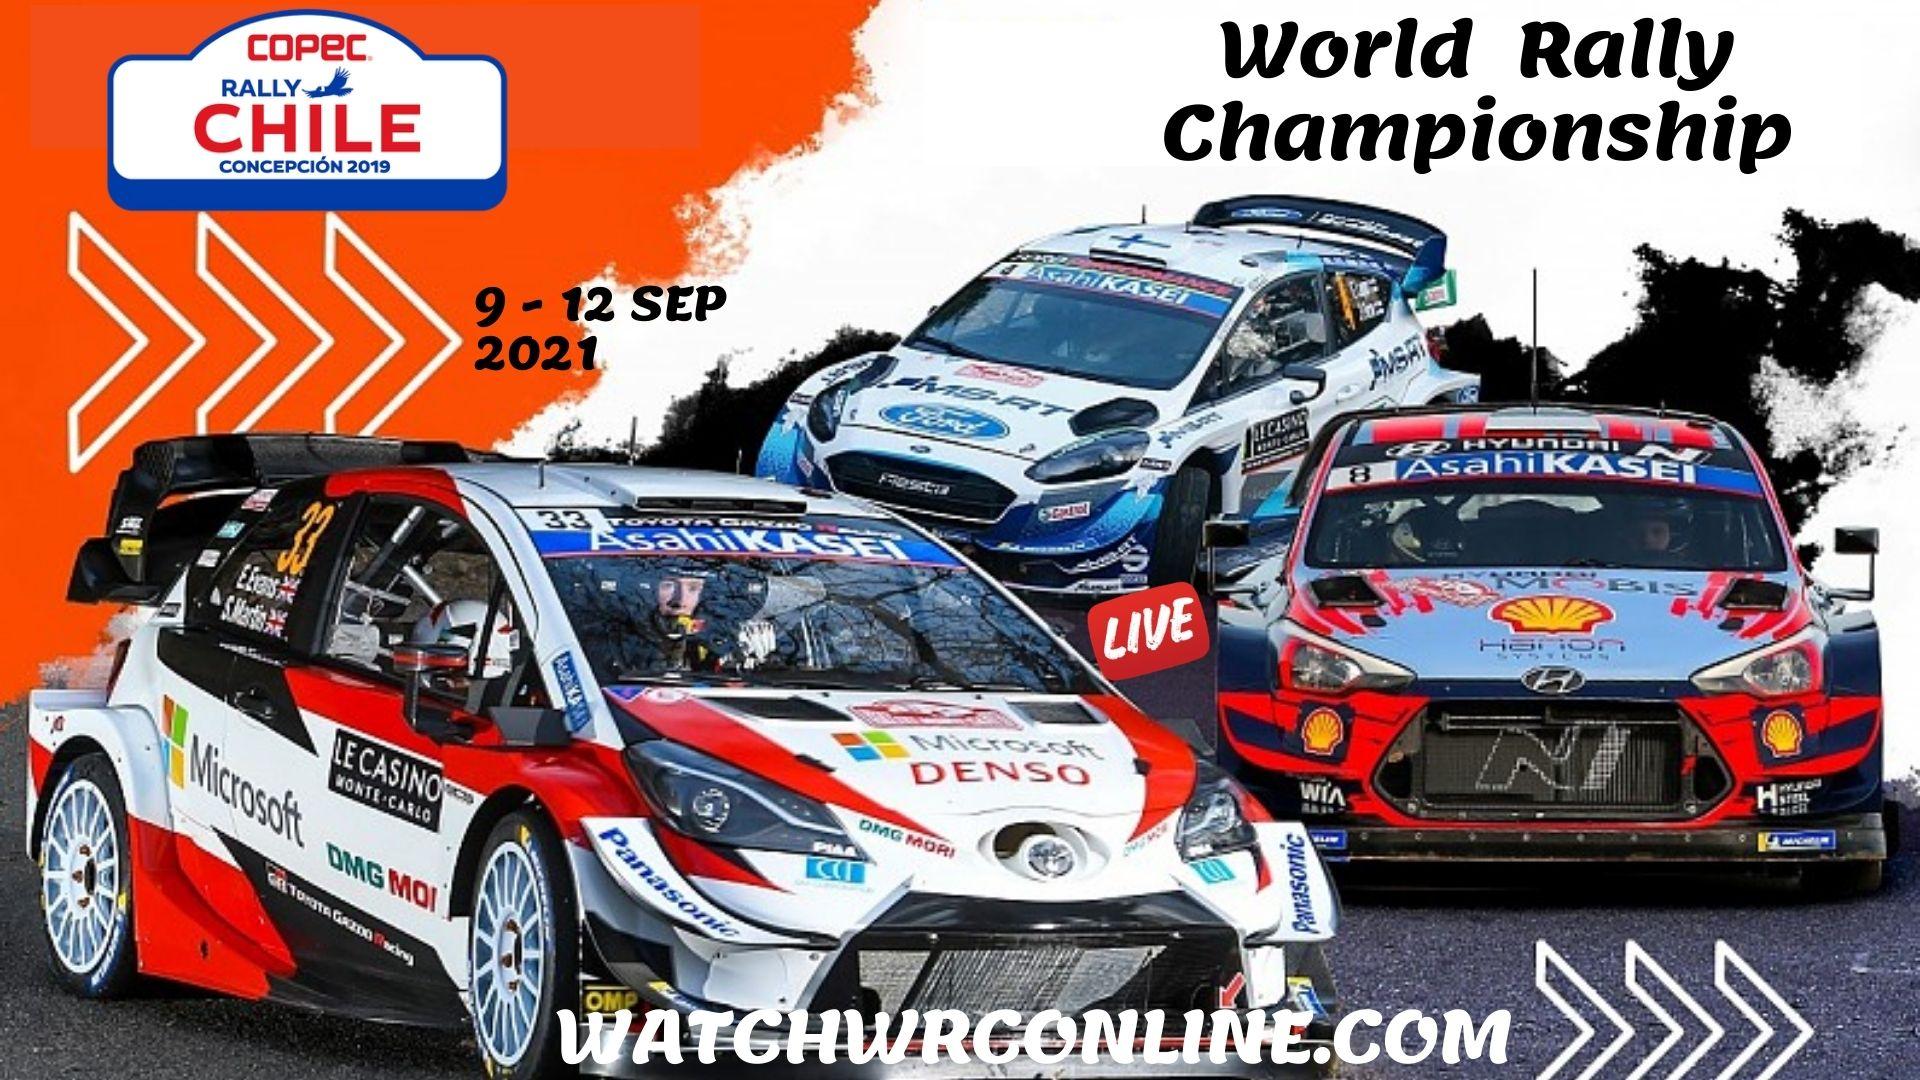 WRC Chile Rally Live Stream 2021